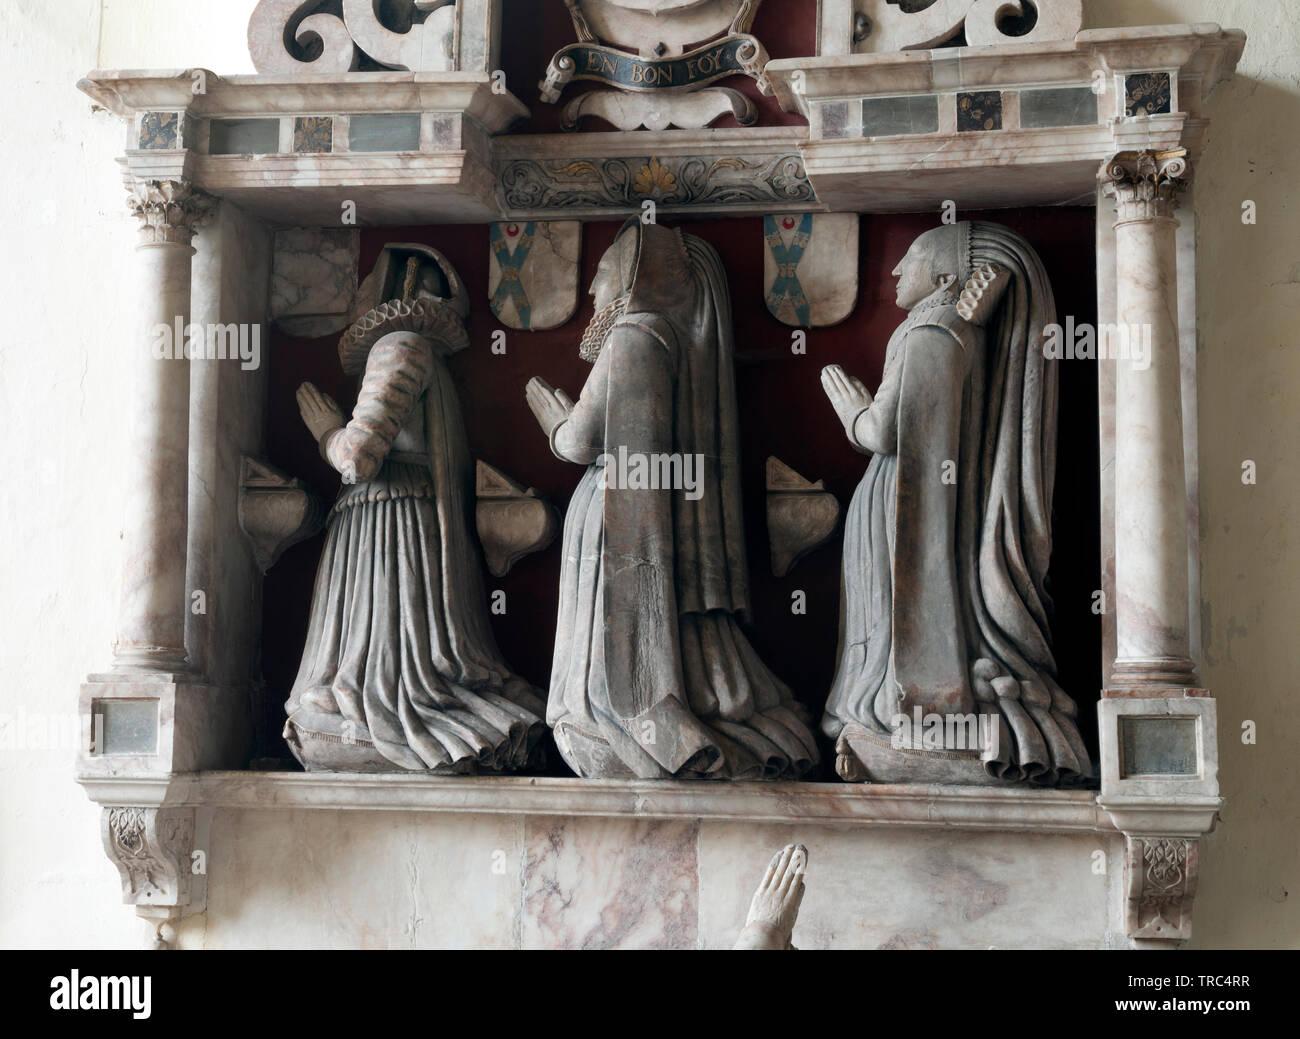 Henry Sacheverall Denkmal, Kirche der Heiligen Dreifaltigkeit, Ratcliffe-on-Soar, Nottinghamshire, England, Großbritannien Stockbild